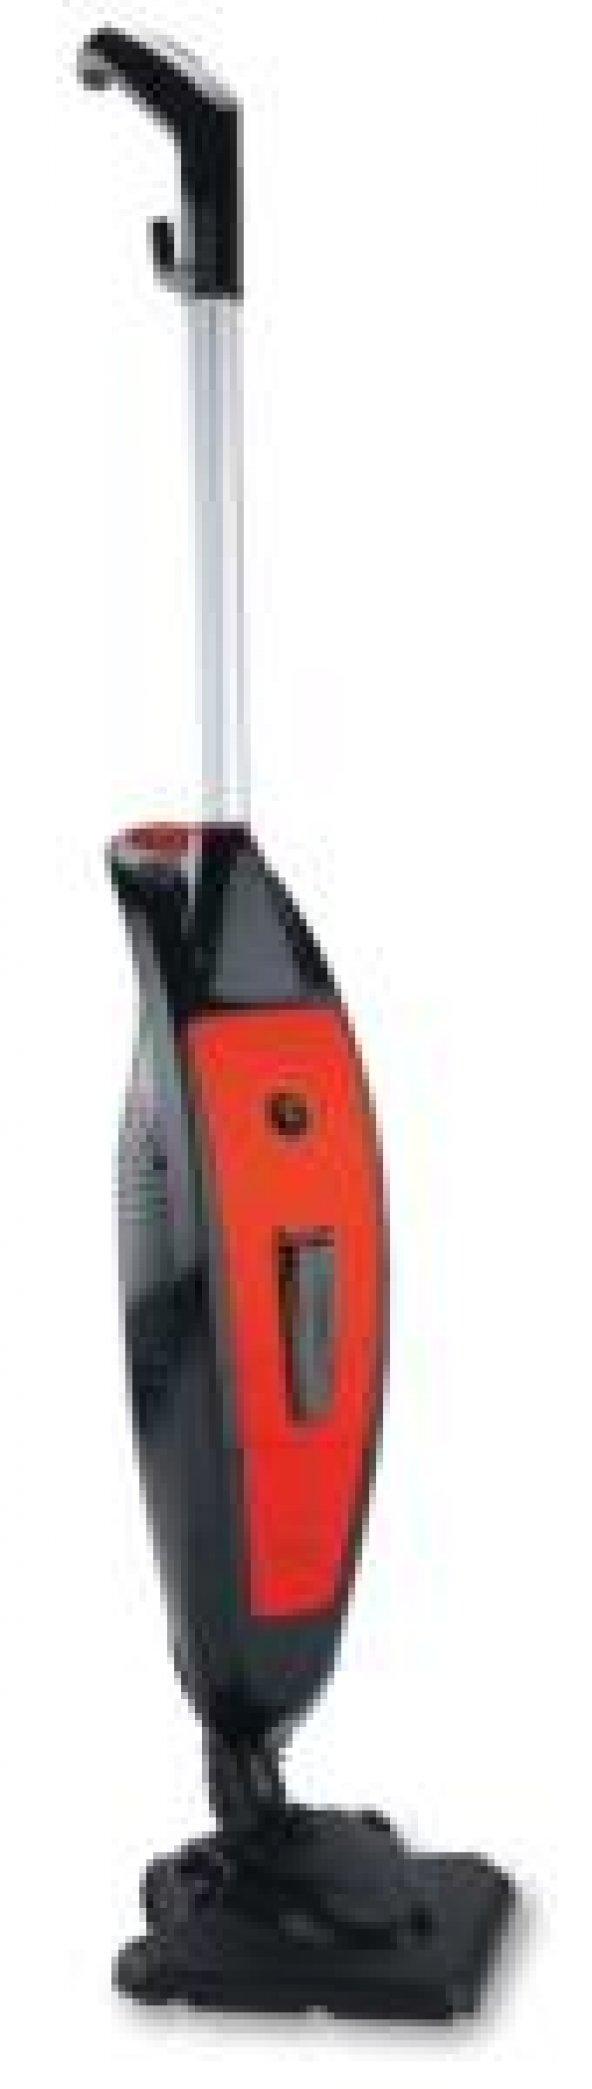 Roxy 900 Watt Elektrikli Süpürge - KMZ01